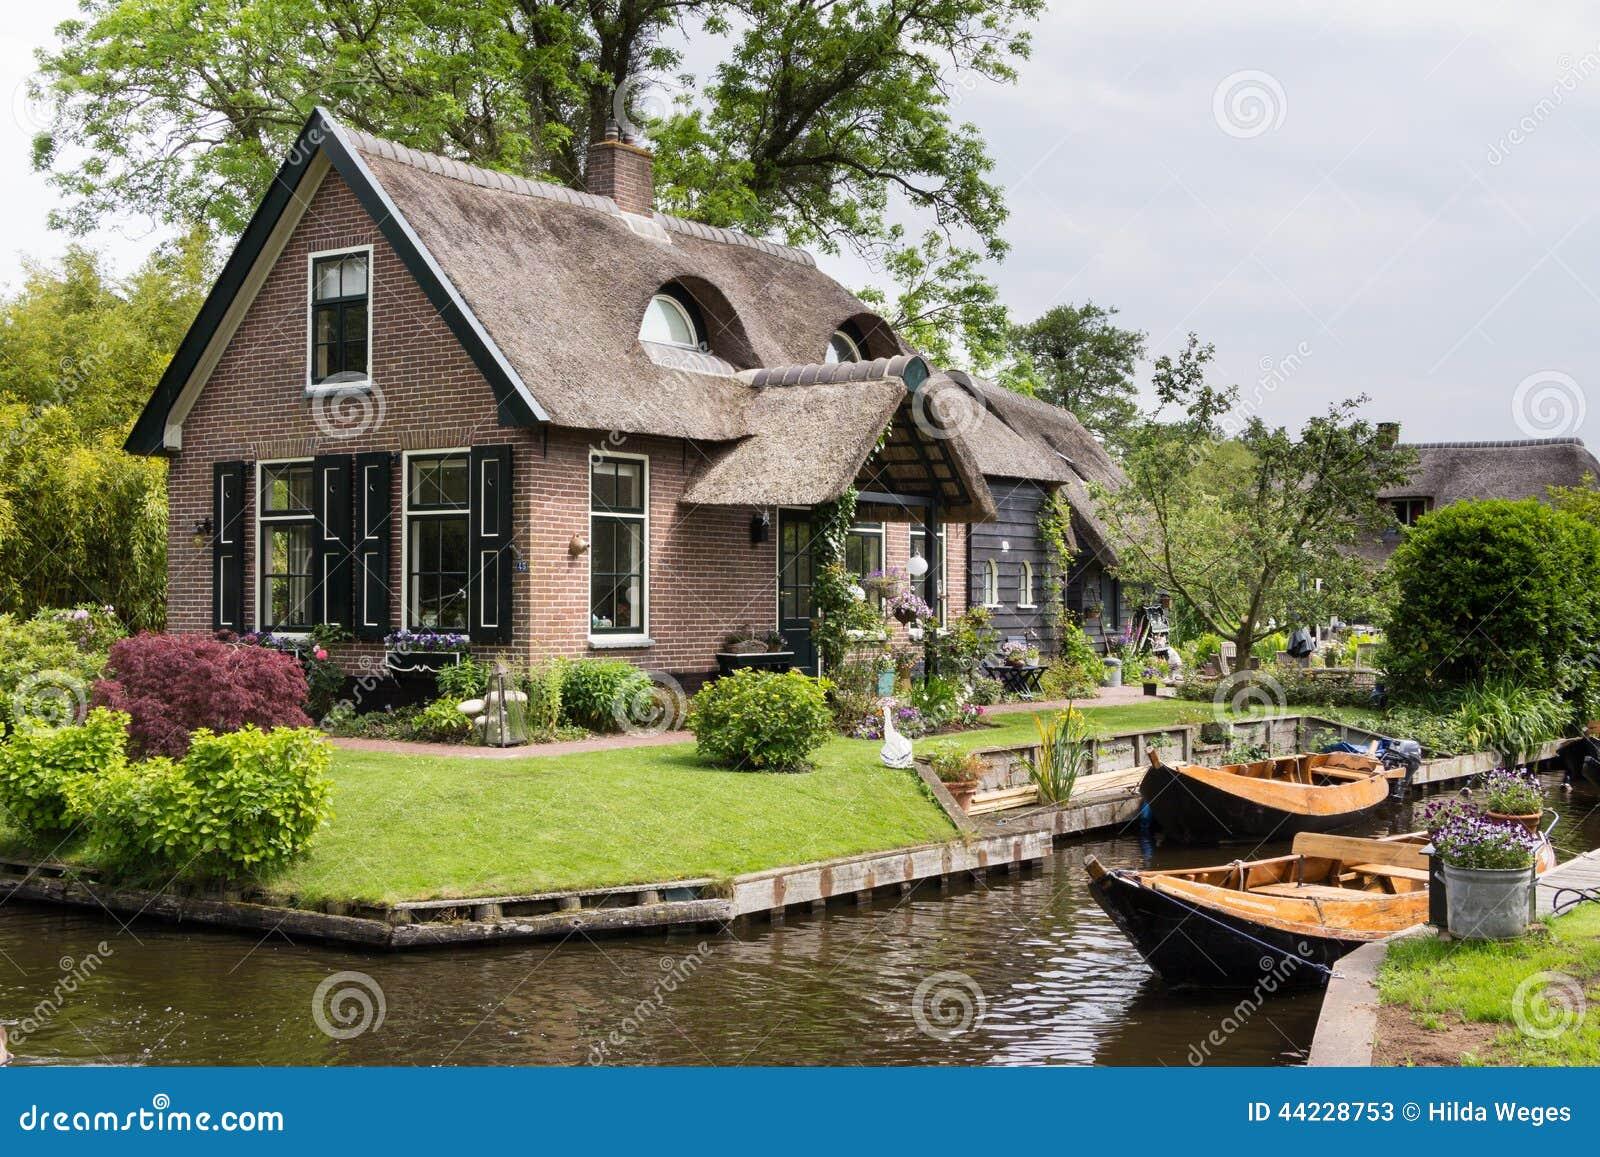 haus in gierhoorn die niederlande stockbild bild 44228753. Black Bedroom Furniture Sets. Home Design Ideas